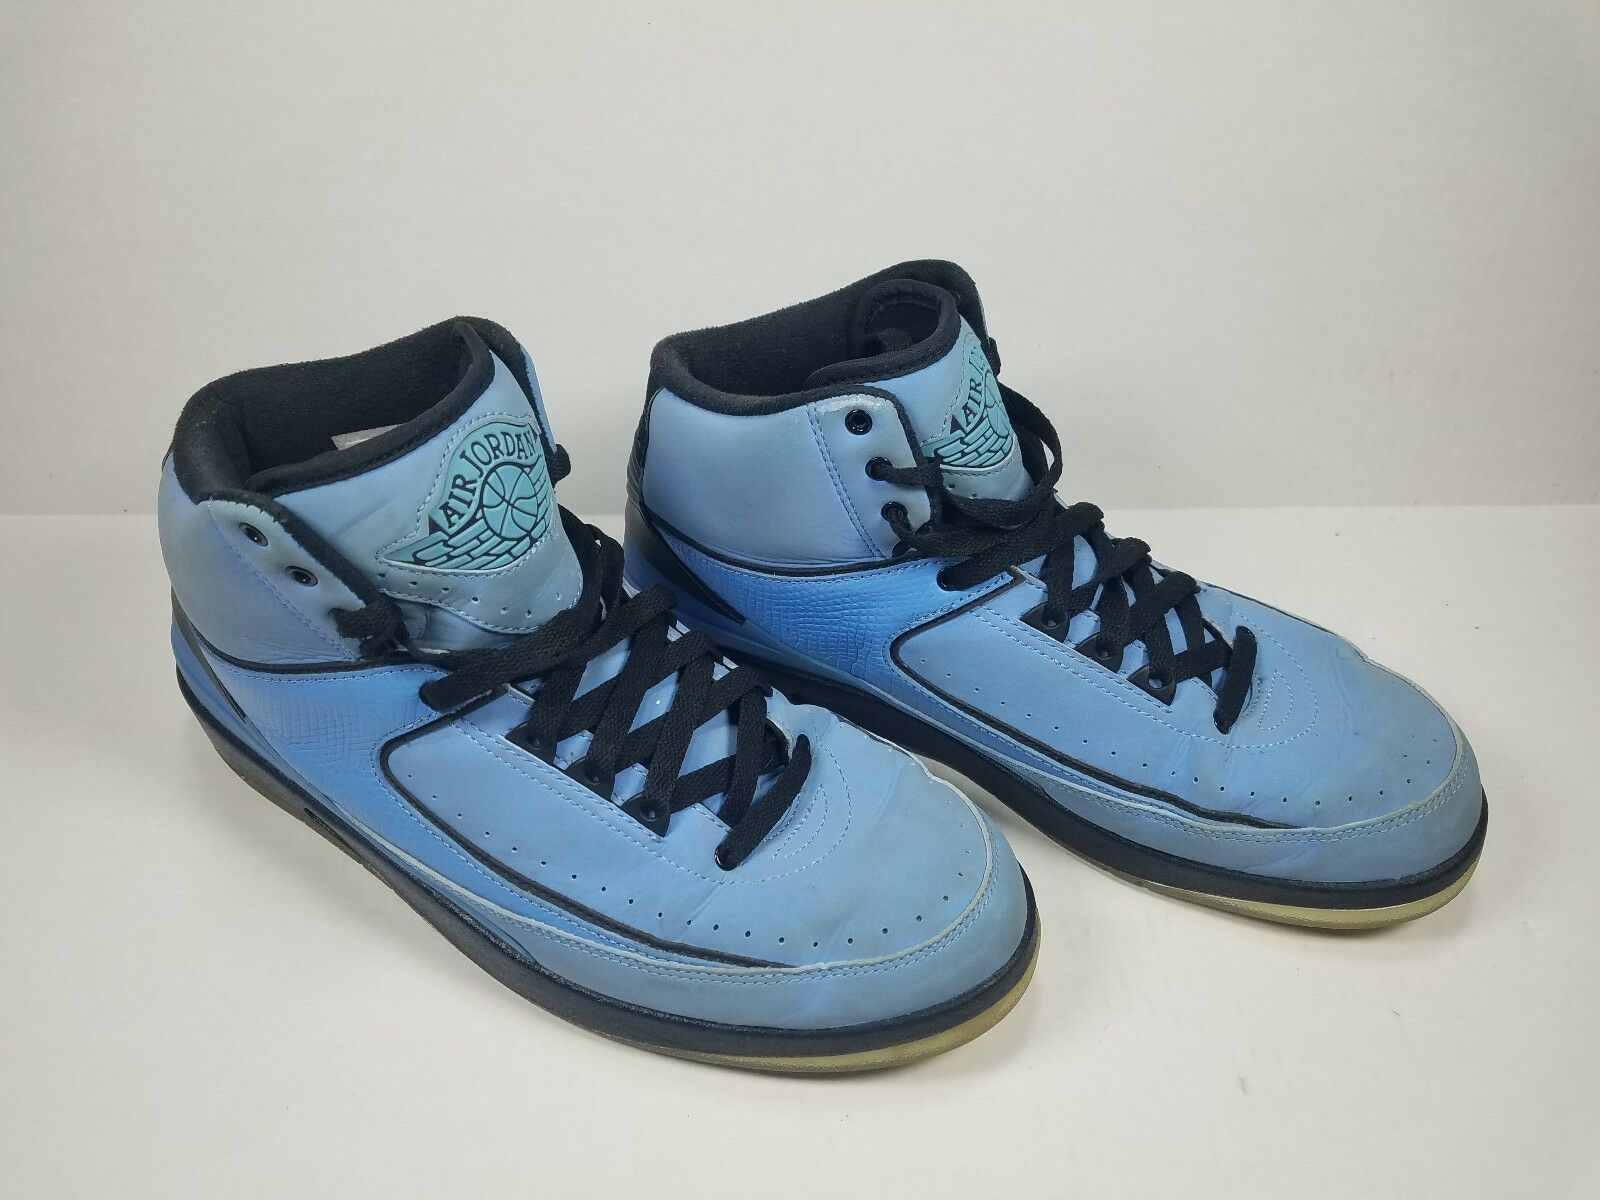 Nike Air Jordan 2 395709-401 Retro Retro Retro QF Univ. bluee Black-White Size 9.5 (2010) VTG 60c924